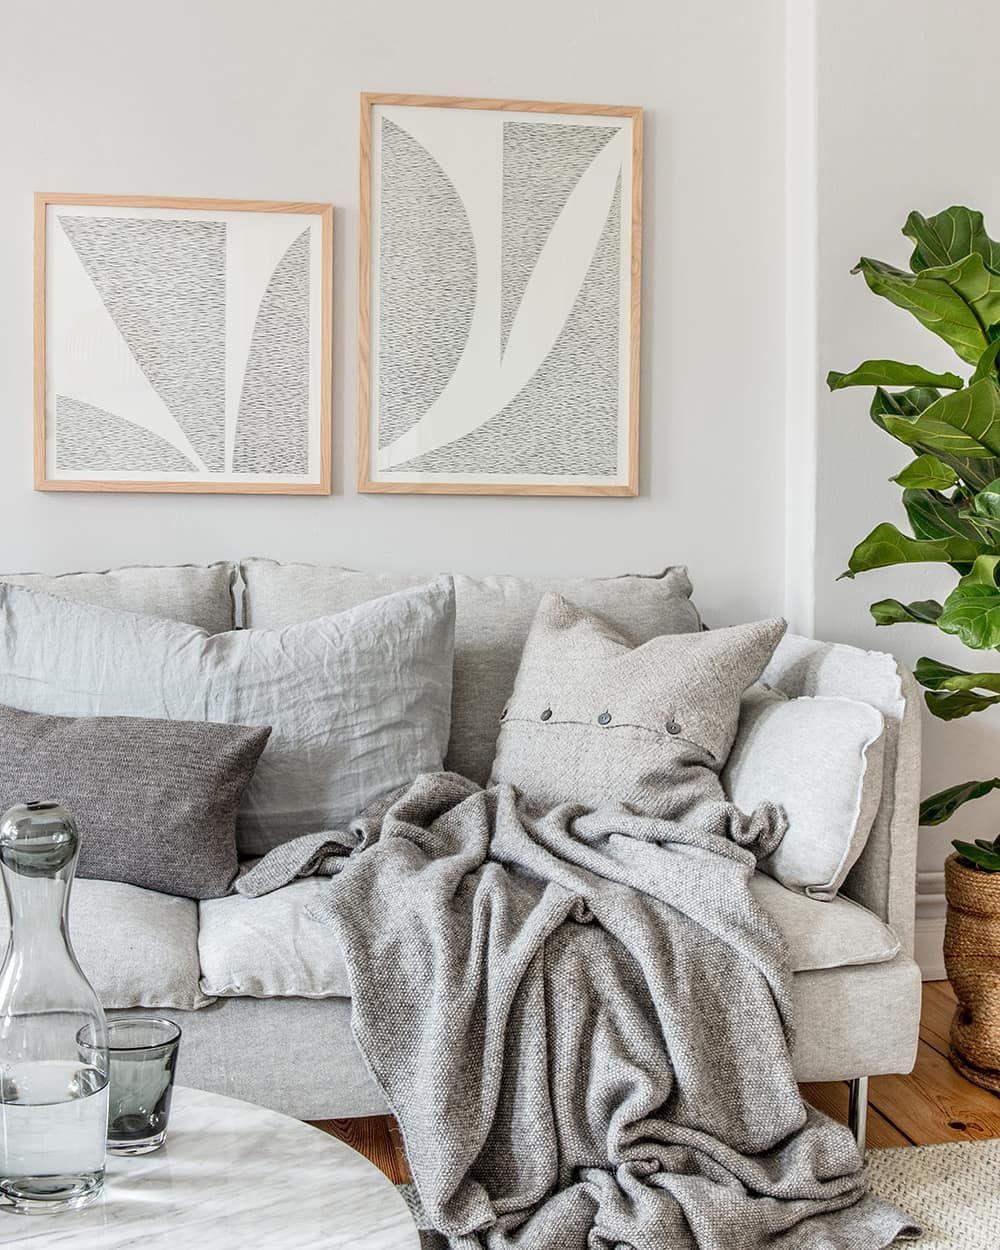 graphite brera lino ikea s derhamn sofa samsta dark gray sofa rh pinterest com